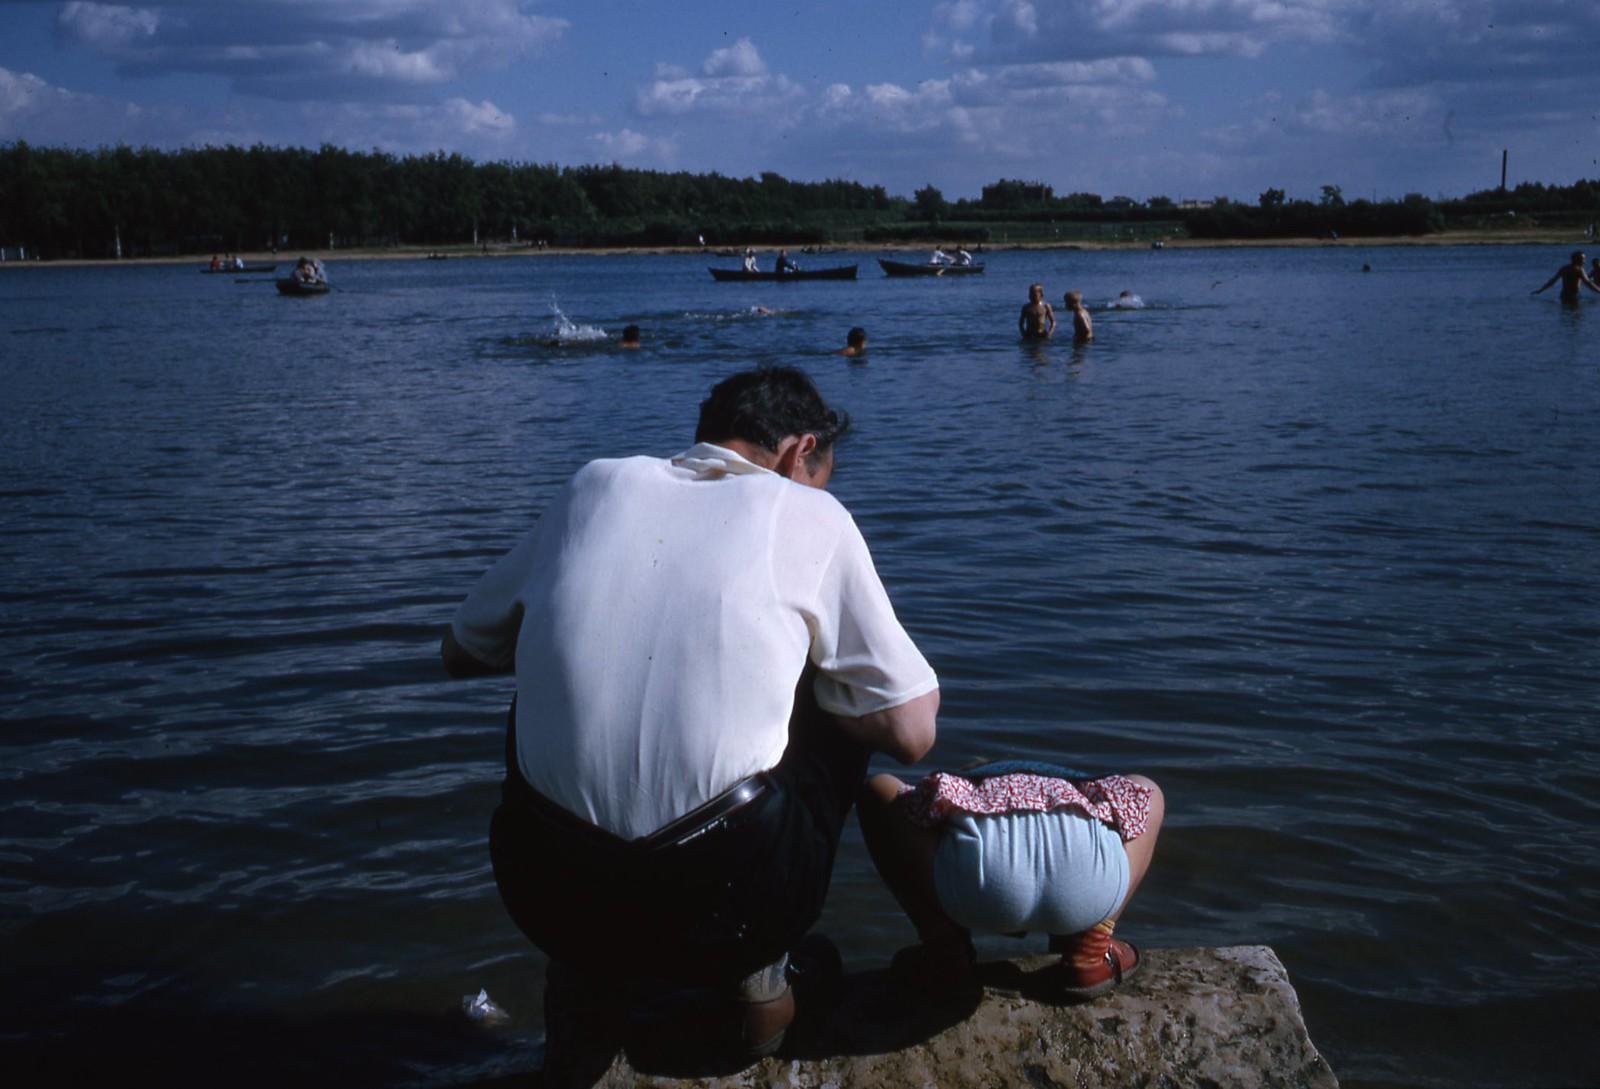 hammond-MA10-Ostankino-people-sunbathing-and-fishing-007